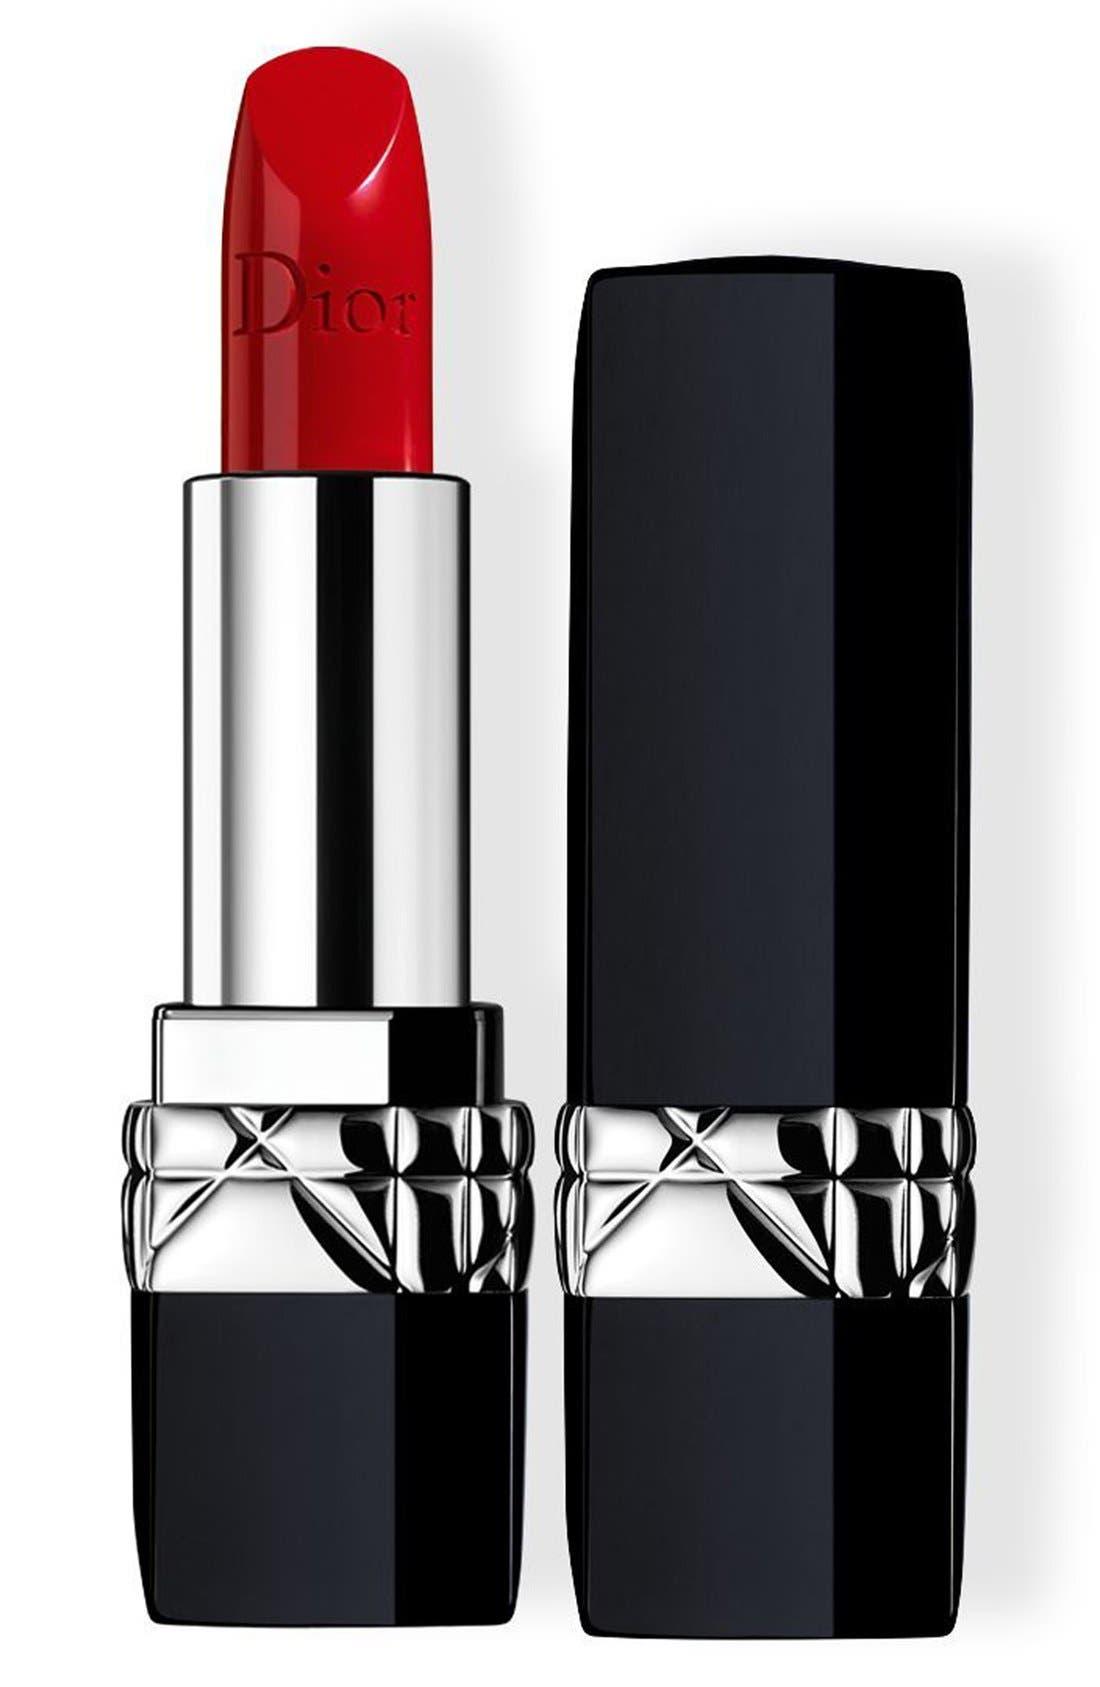 Dior Couture Color Rouge Dior Lipstick - 999